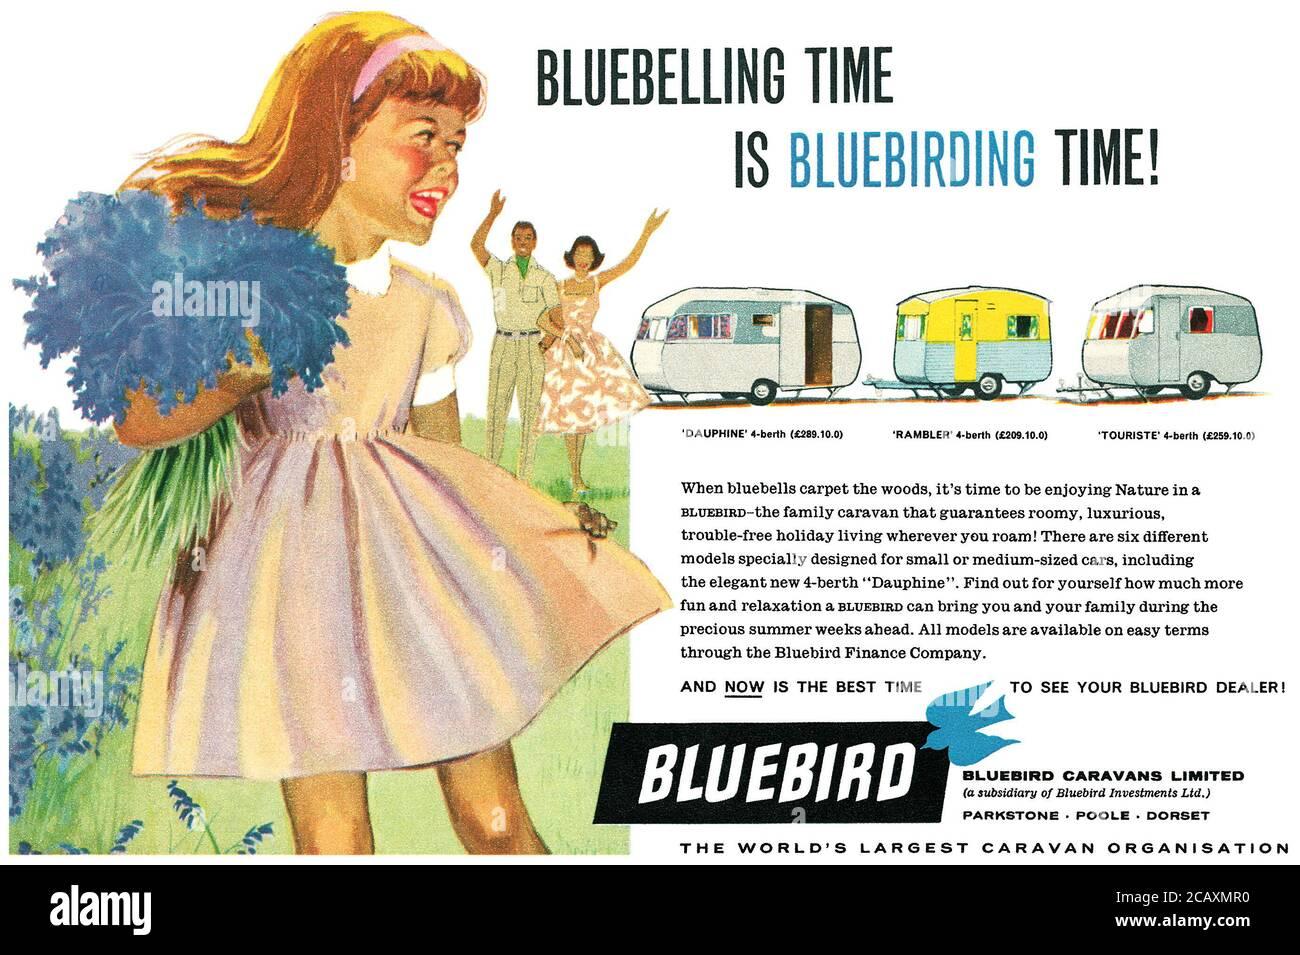 1960 British advertisement for Bluebird caravans. Stock Photo